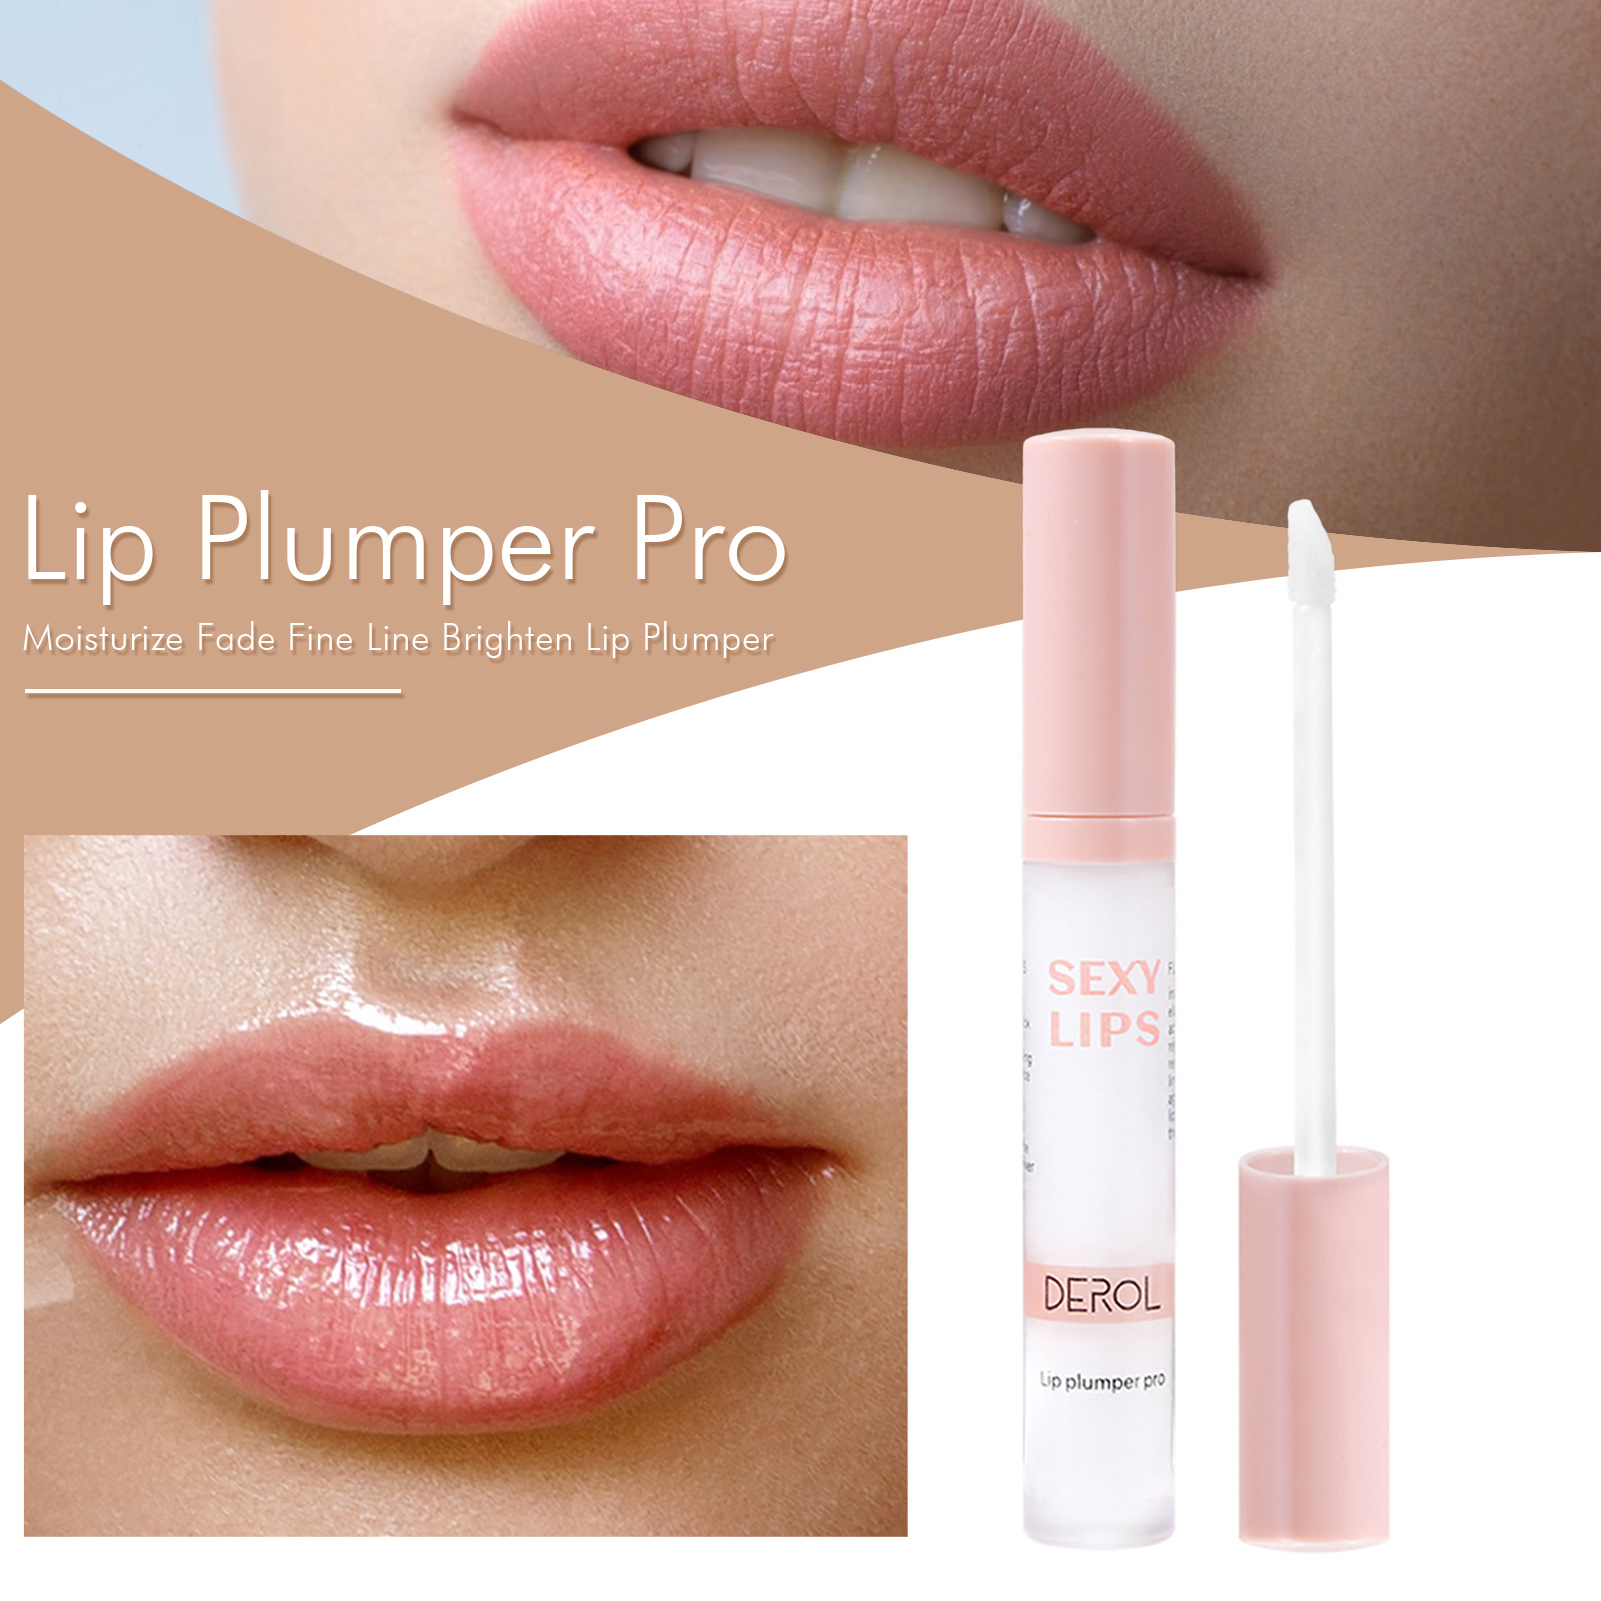 Lip Plumper Instant Volume Lips Plumper Oil Moisturizing Repairing Reduce Lip Fine Line Cosmetics Sexy Lip Plump Enhancer Makeup